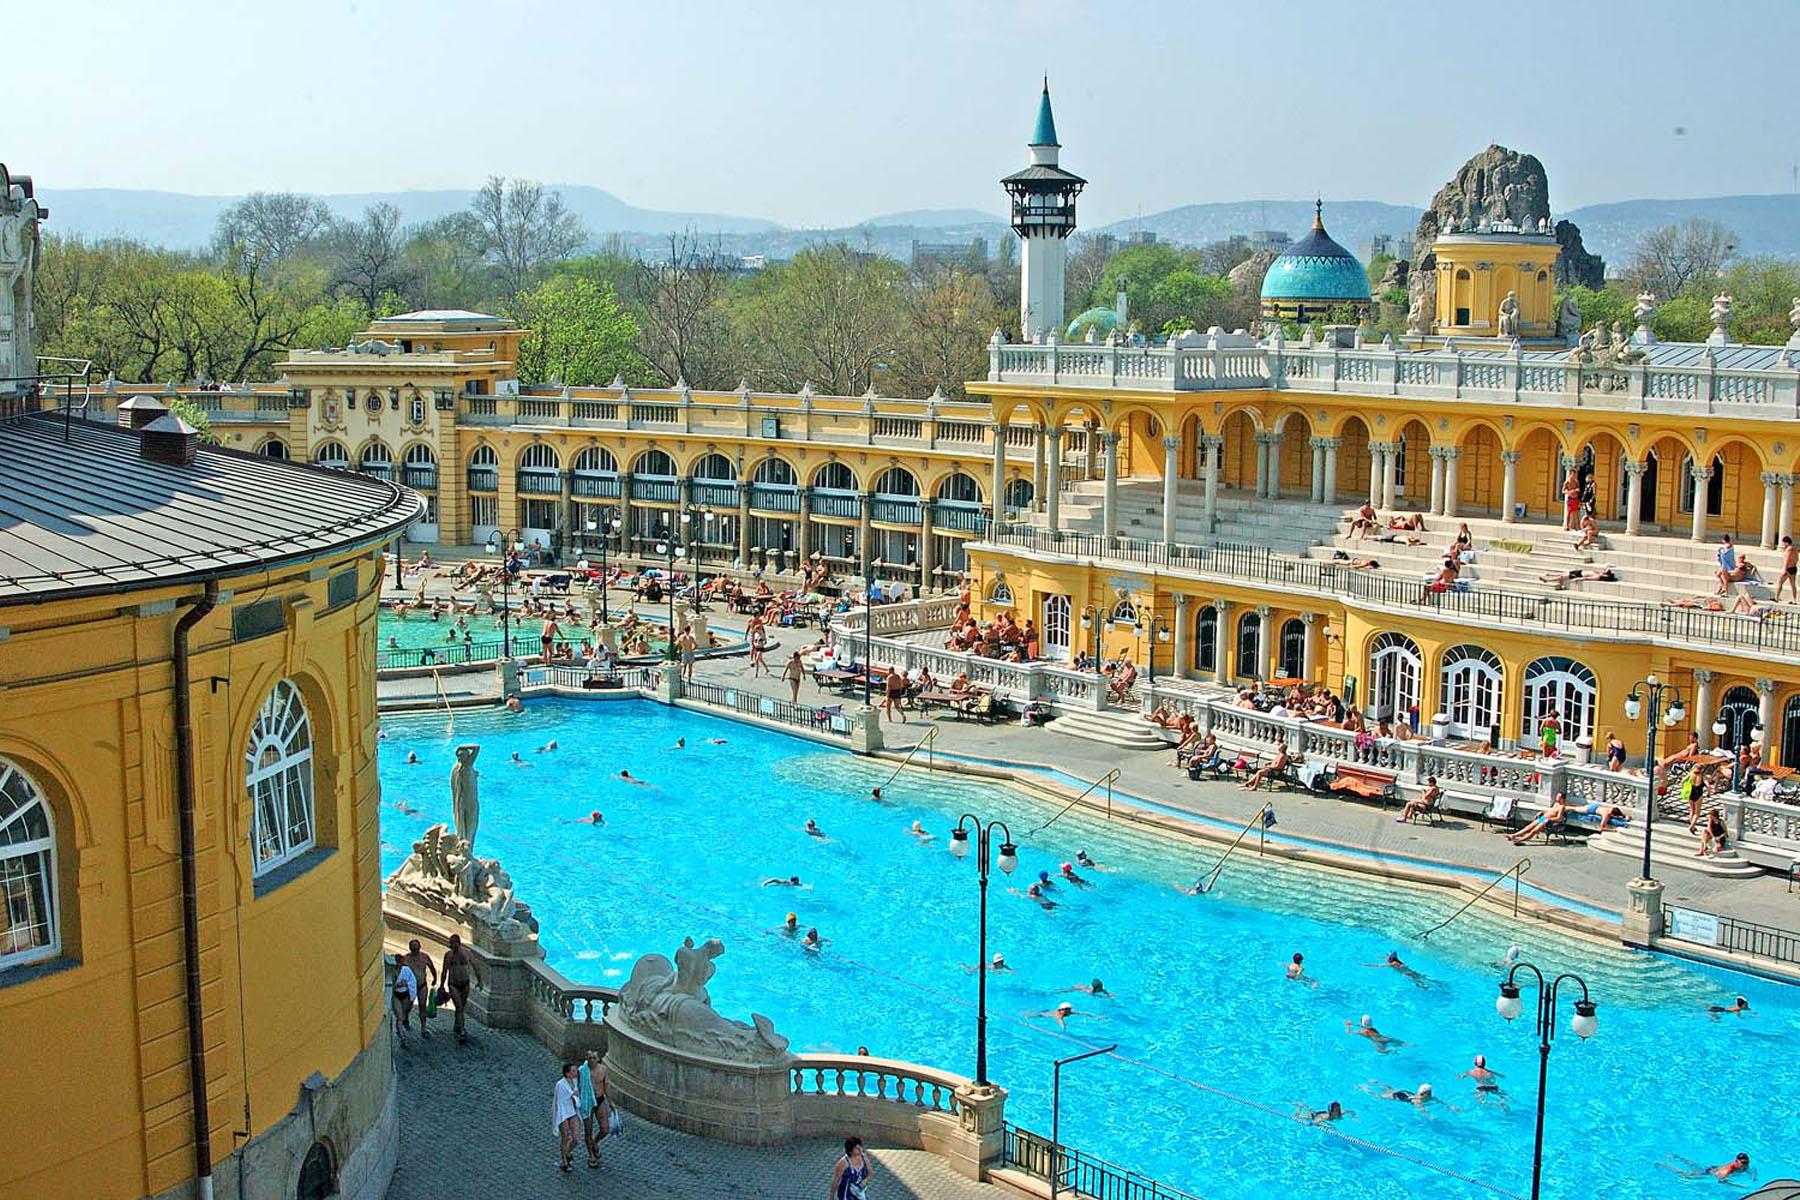 Szechenyi bath 16559587032 o